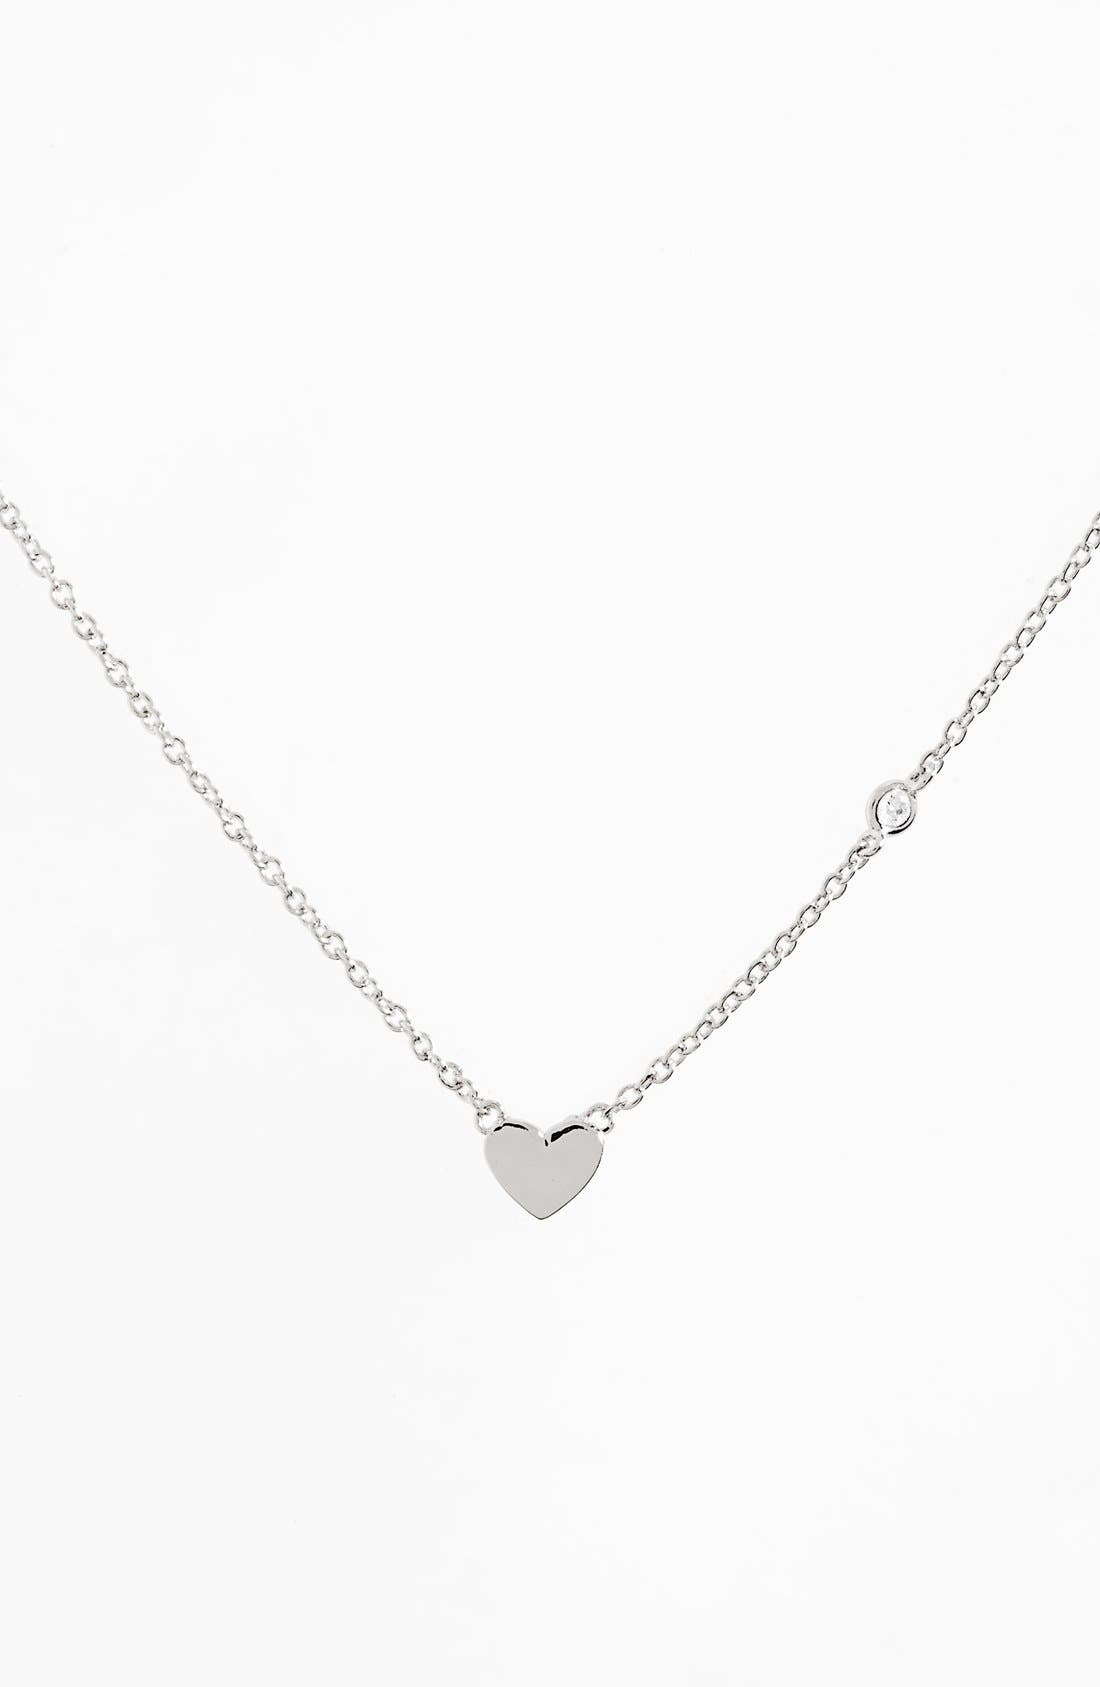 Heart Necklace,                         Main,                         color, Silver